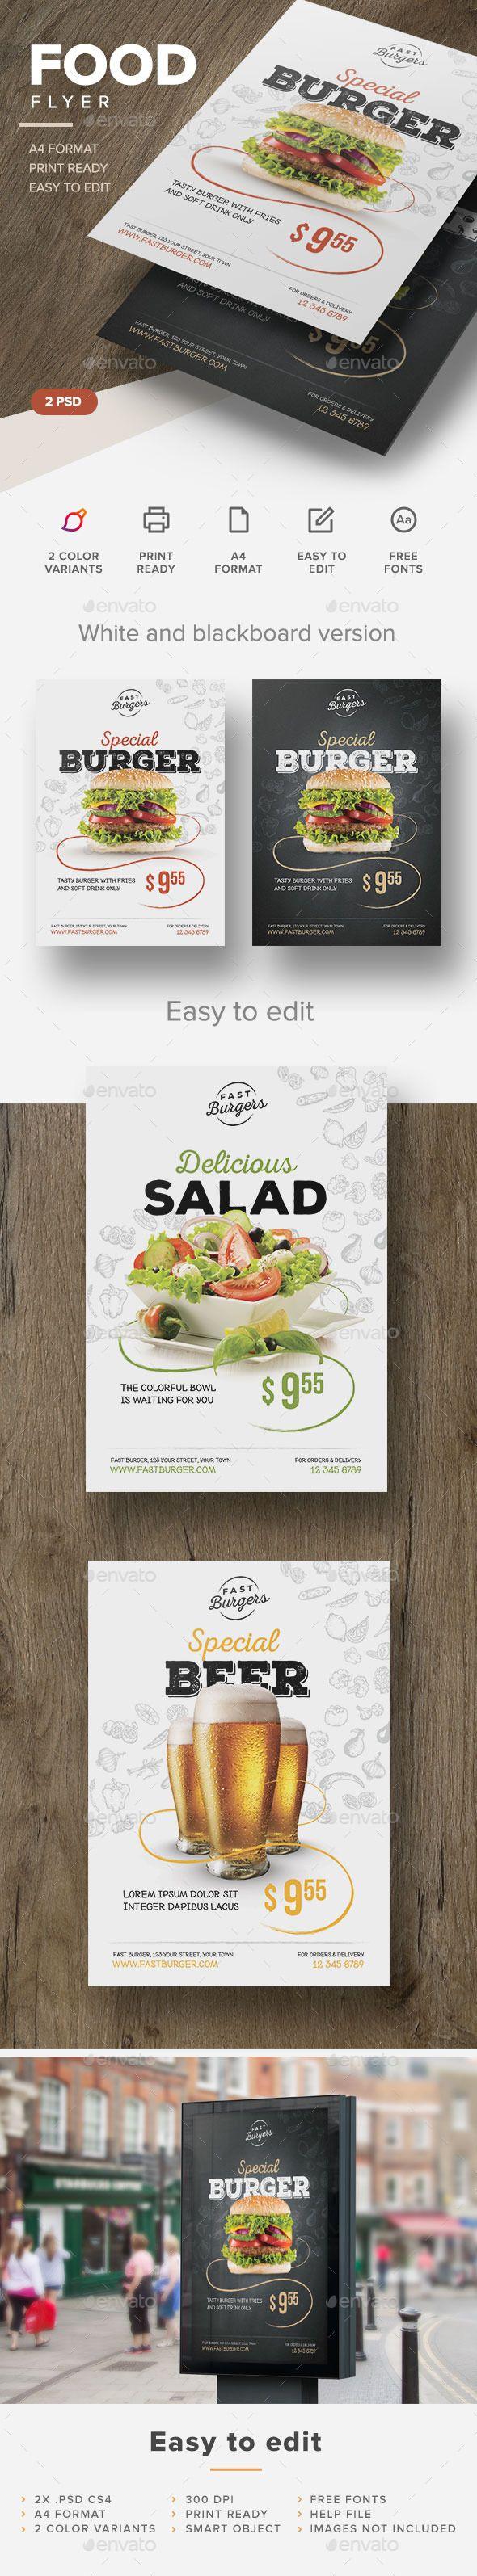 Food Flyer  Restaurants Food And Menu